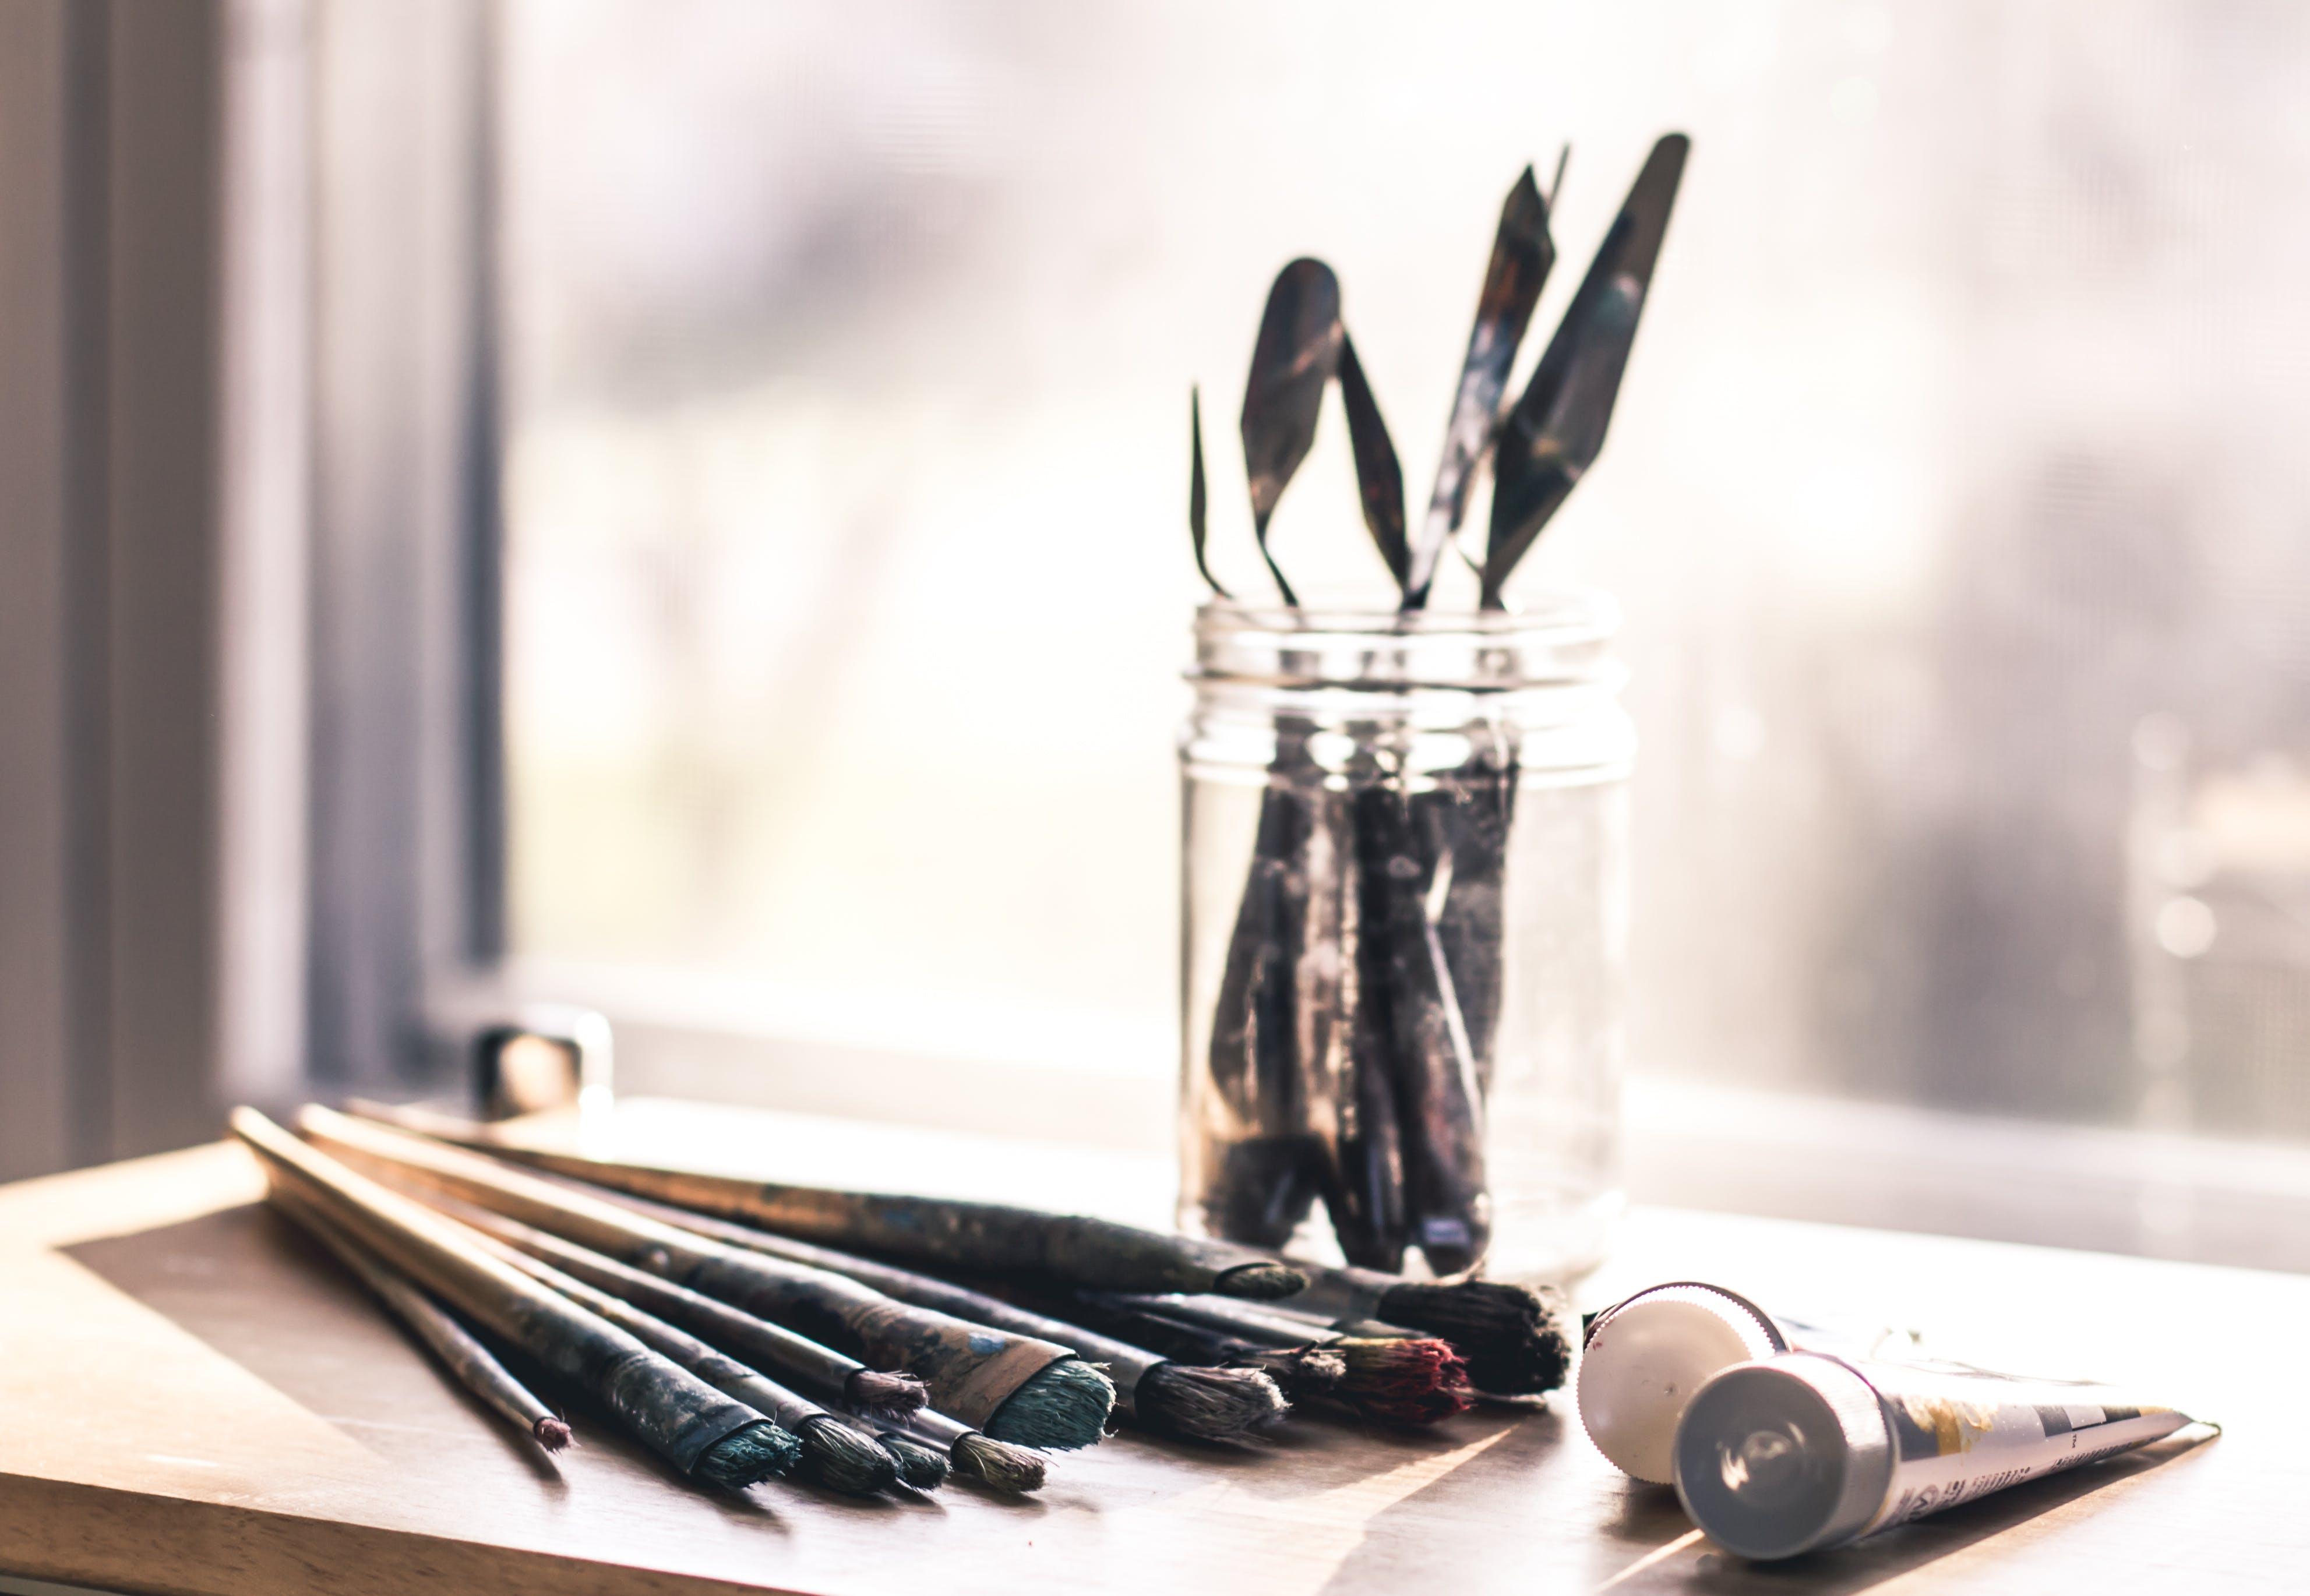 Kostnadsfri bild av glasburk, inomhus, måla, oskärpa